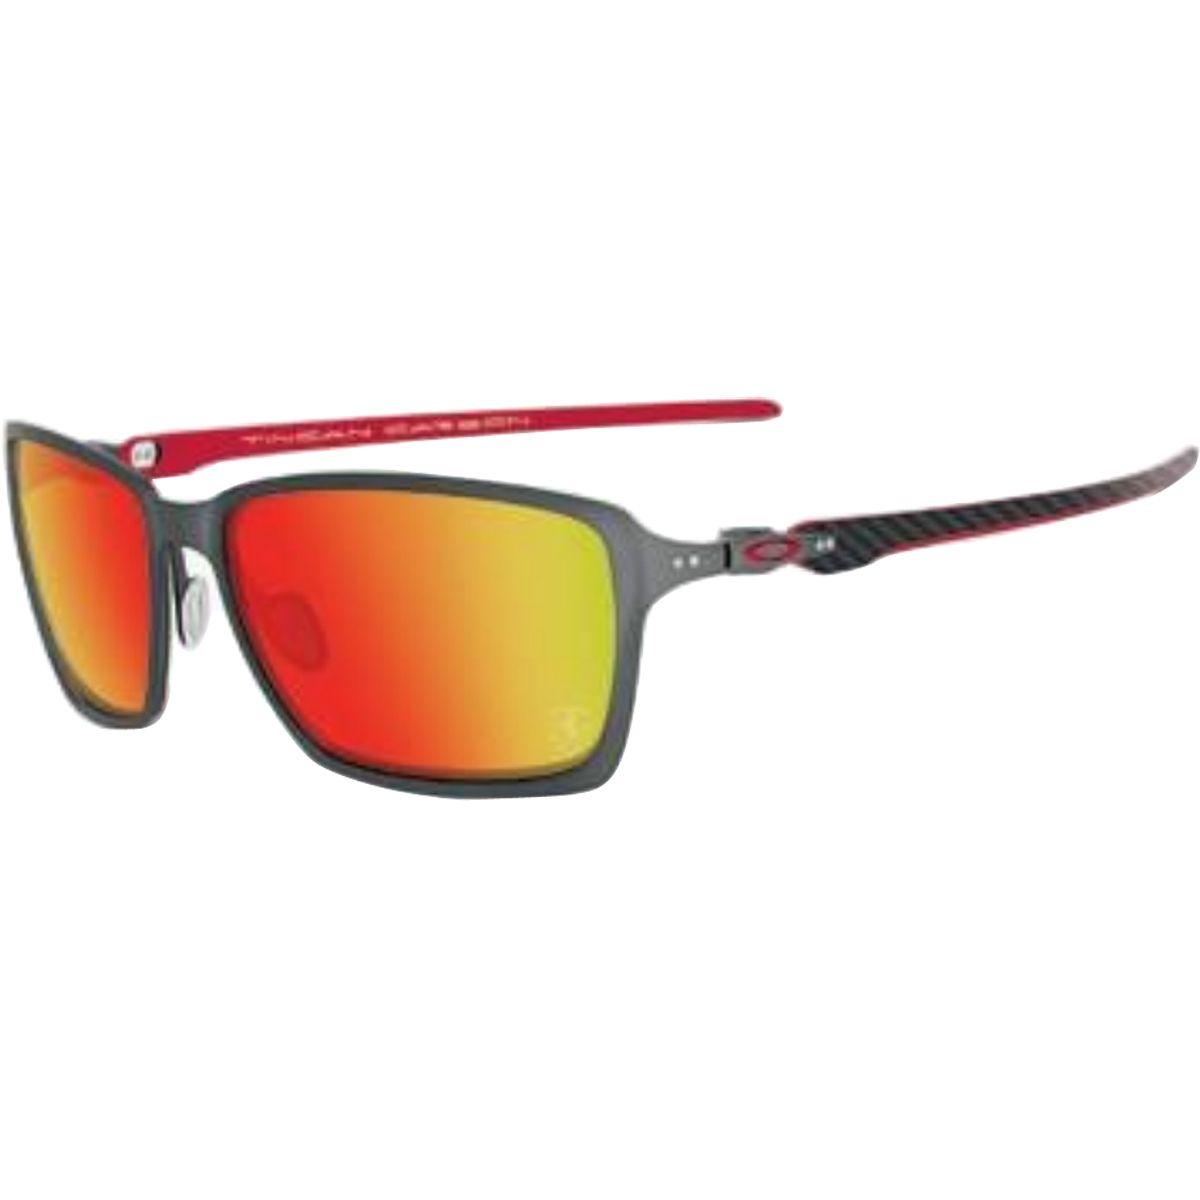 Oakley Tincan Ferrari Men s Sportswear Sunglasses - Motorhelmets ... 8287111db1